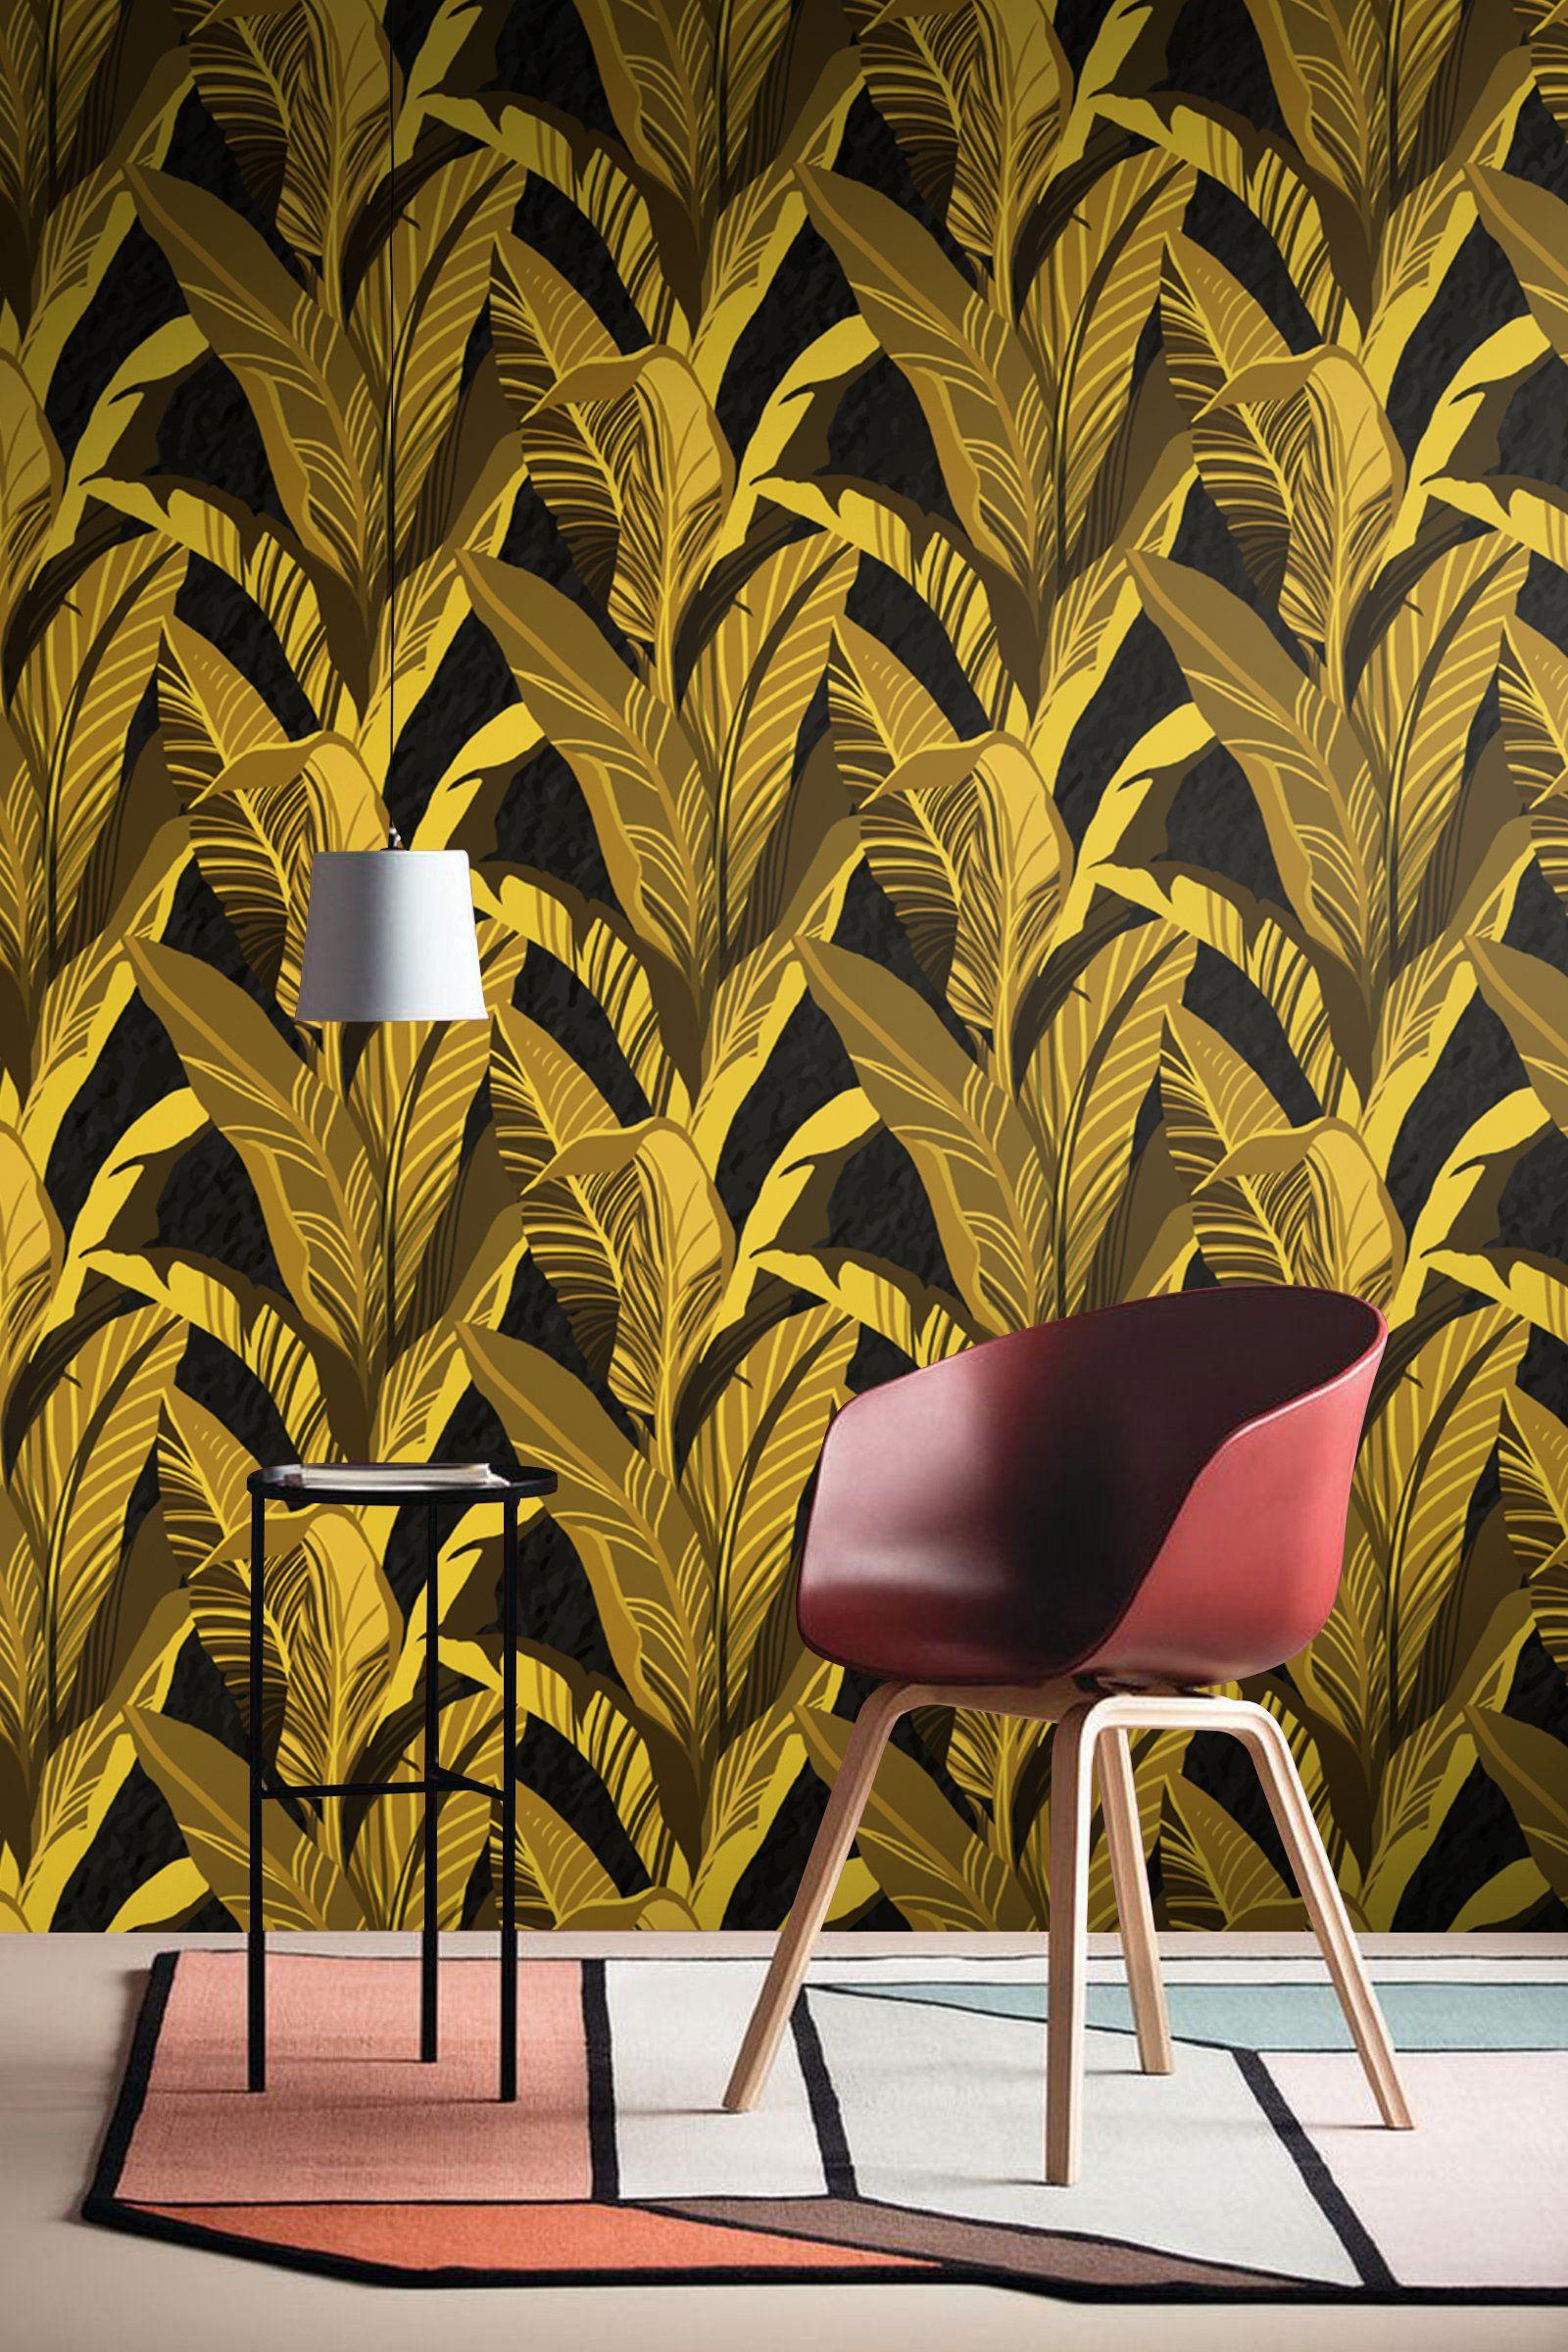 Yellow Banana Leaves Wallpaper Tropical Bedroom Wall Poster Etsy Banana Leaf Wallpaper Leaf Wallpaper Living Room Murals